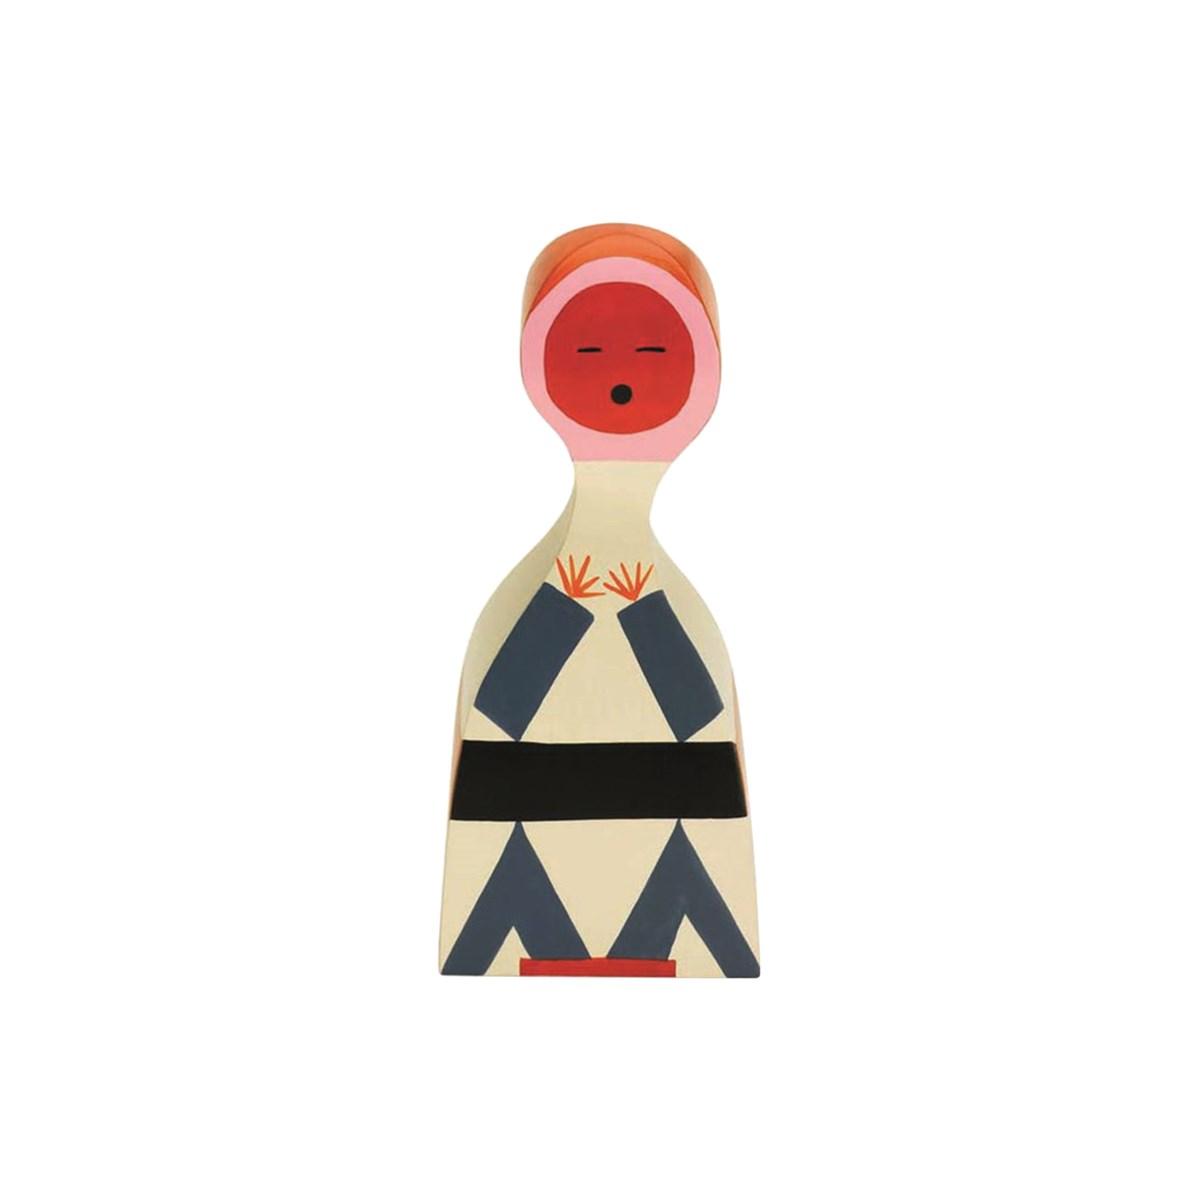 Vitra-Alexander-Girard-Wooden-Doll-No.18-Matisse-1